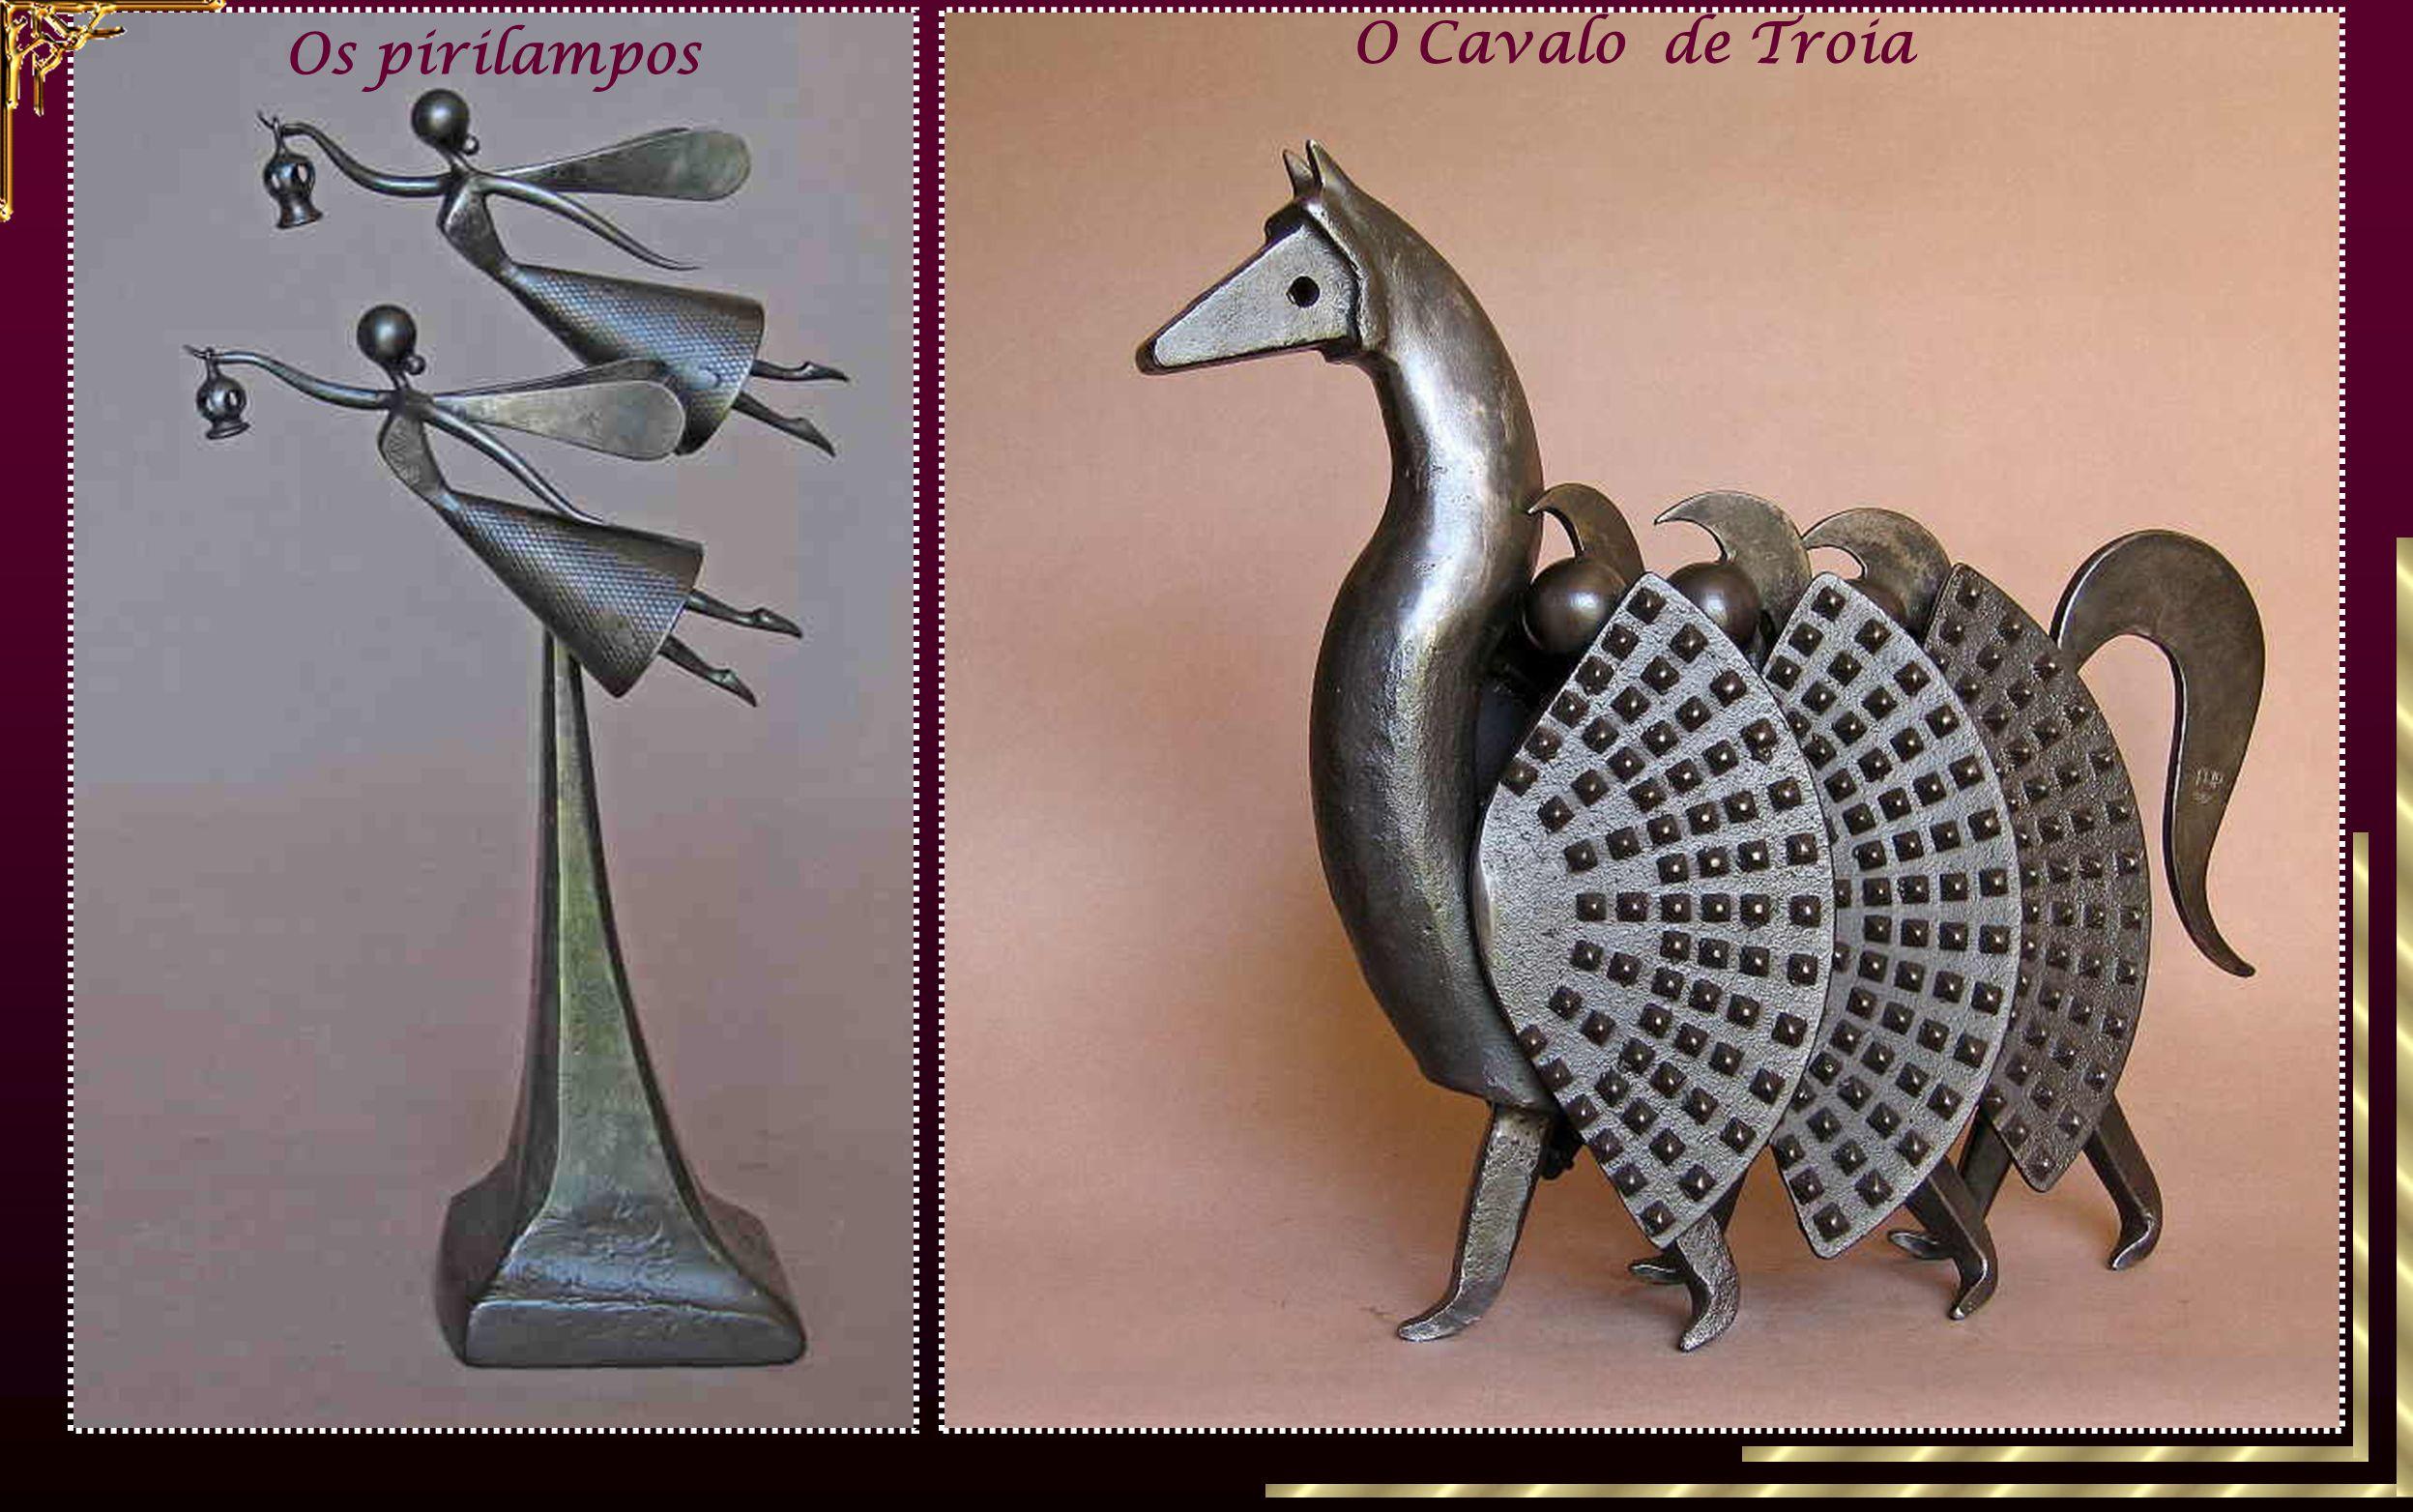 O Cavalo de Troia Os pirilampos